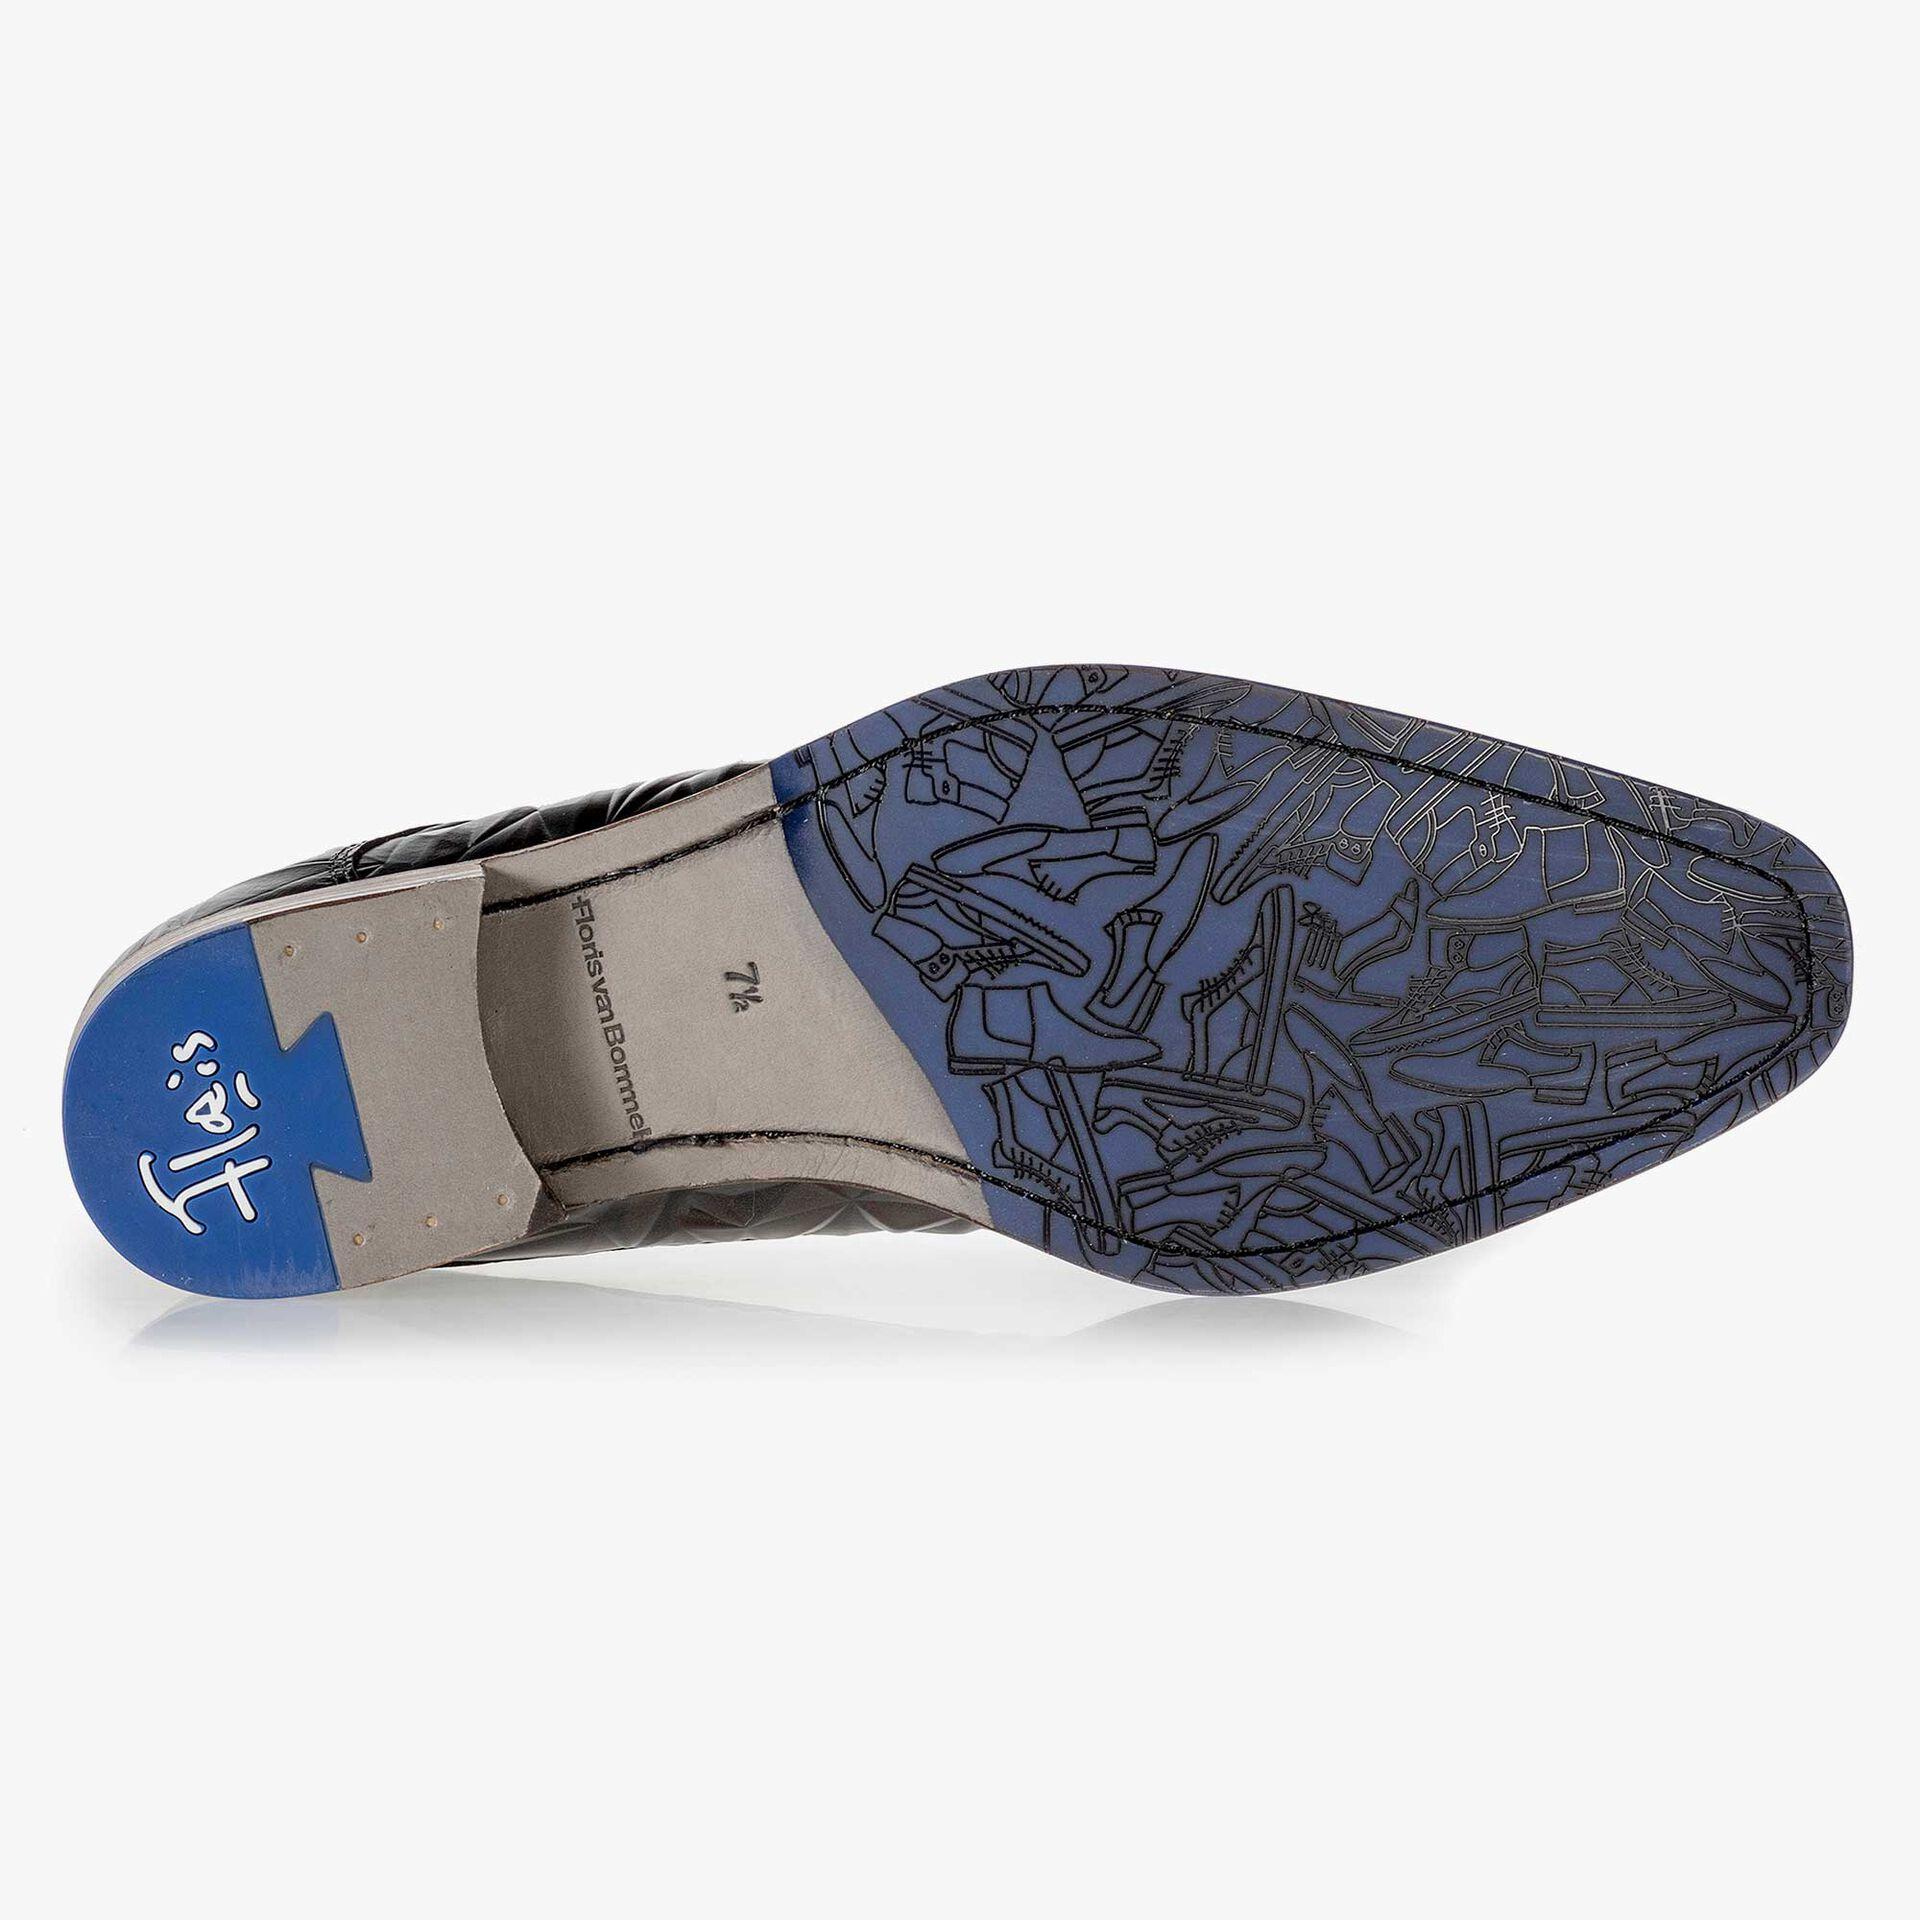 Floris van Bommel men's dark brown leather lace shoe finished with a black 3D print